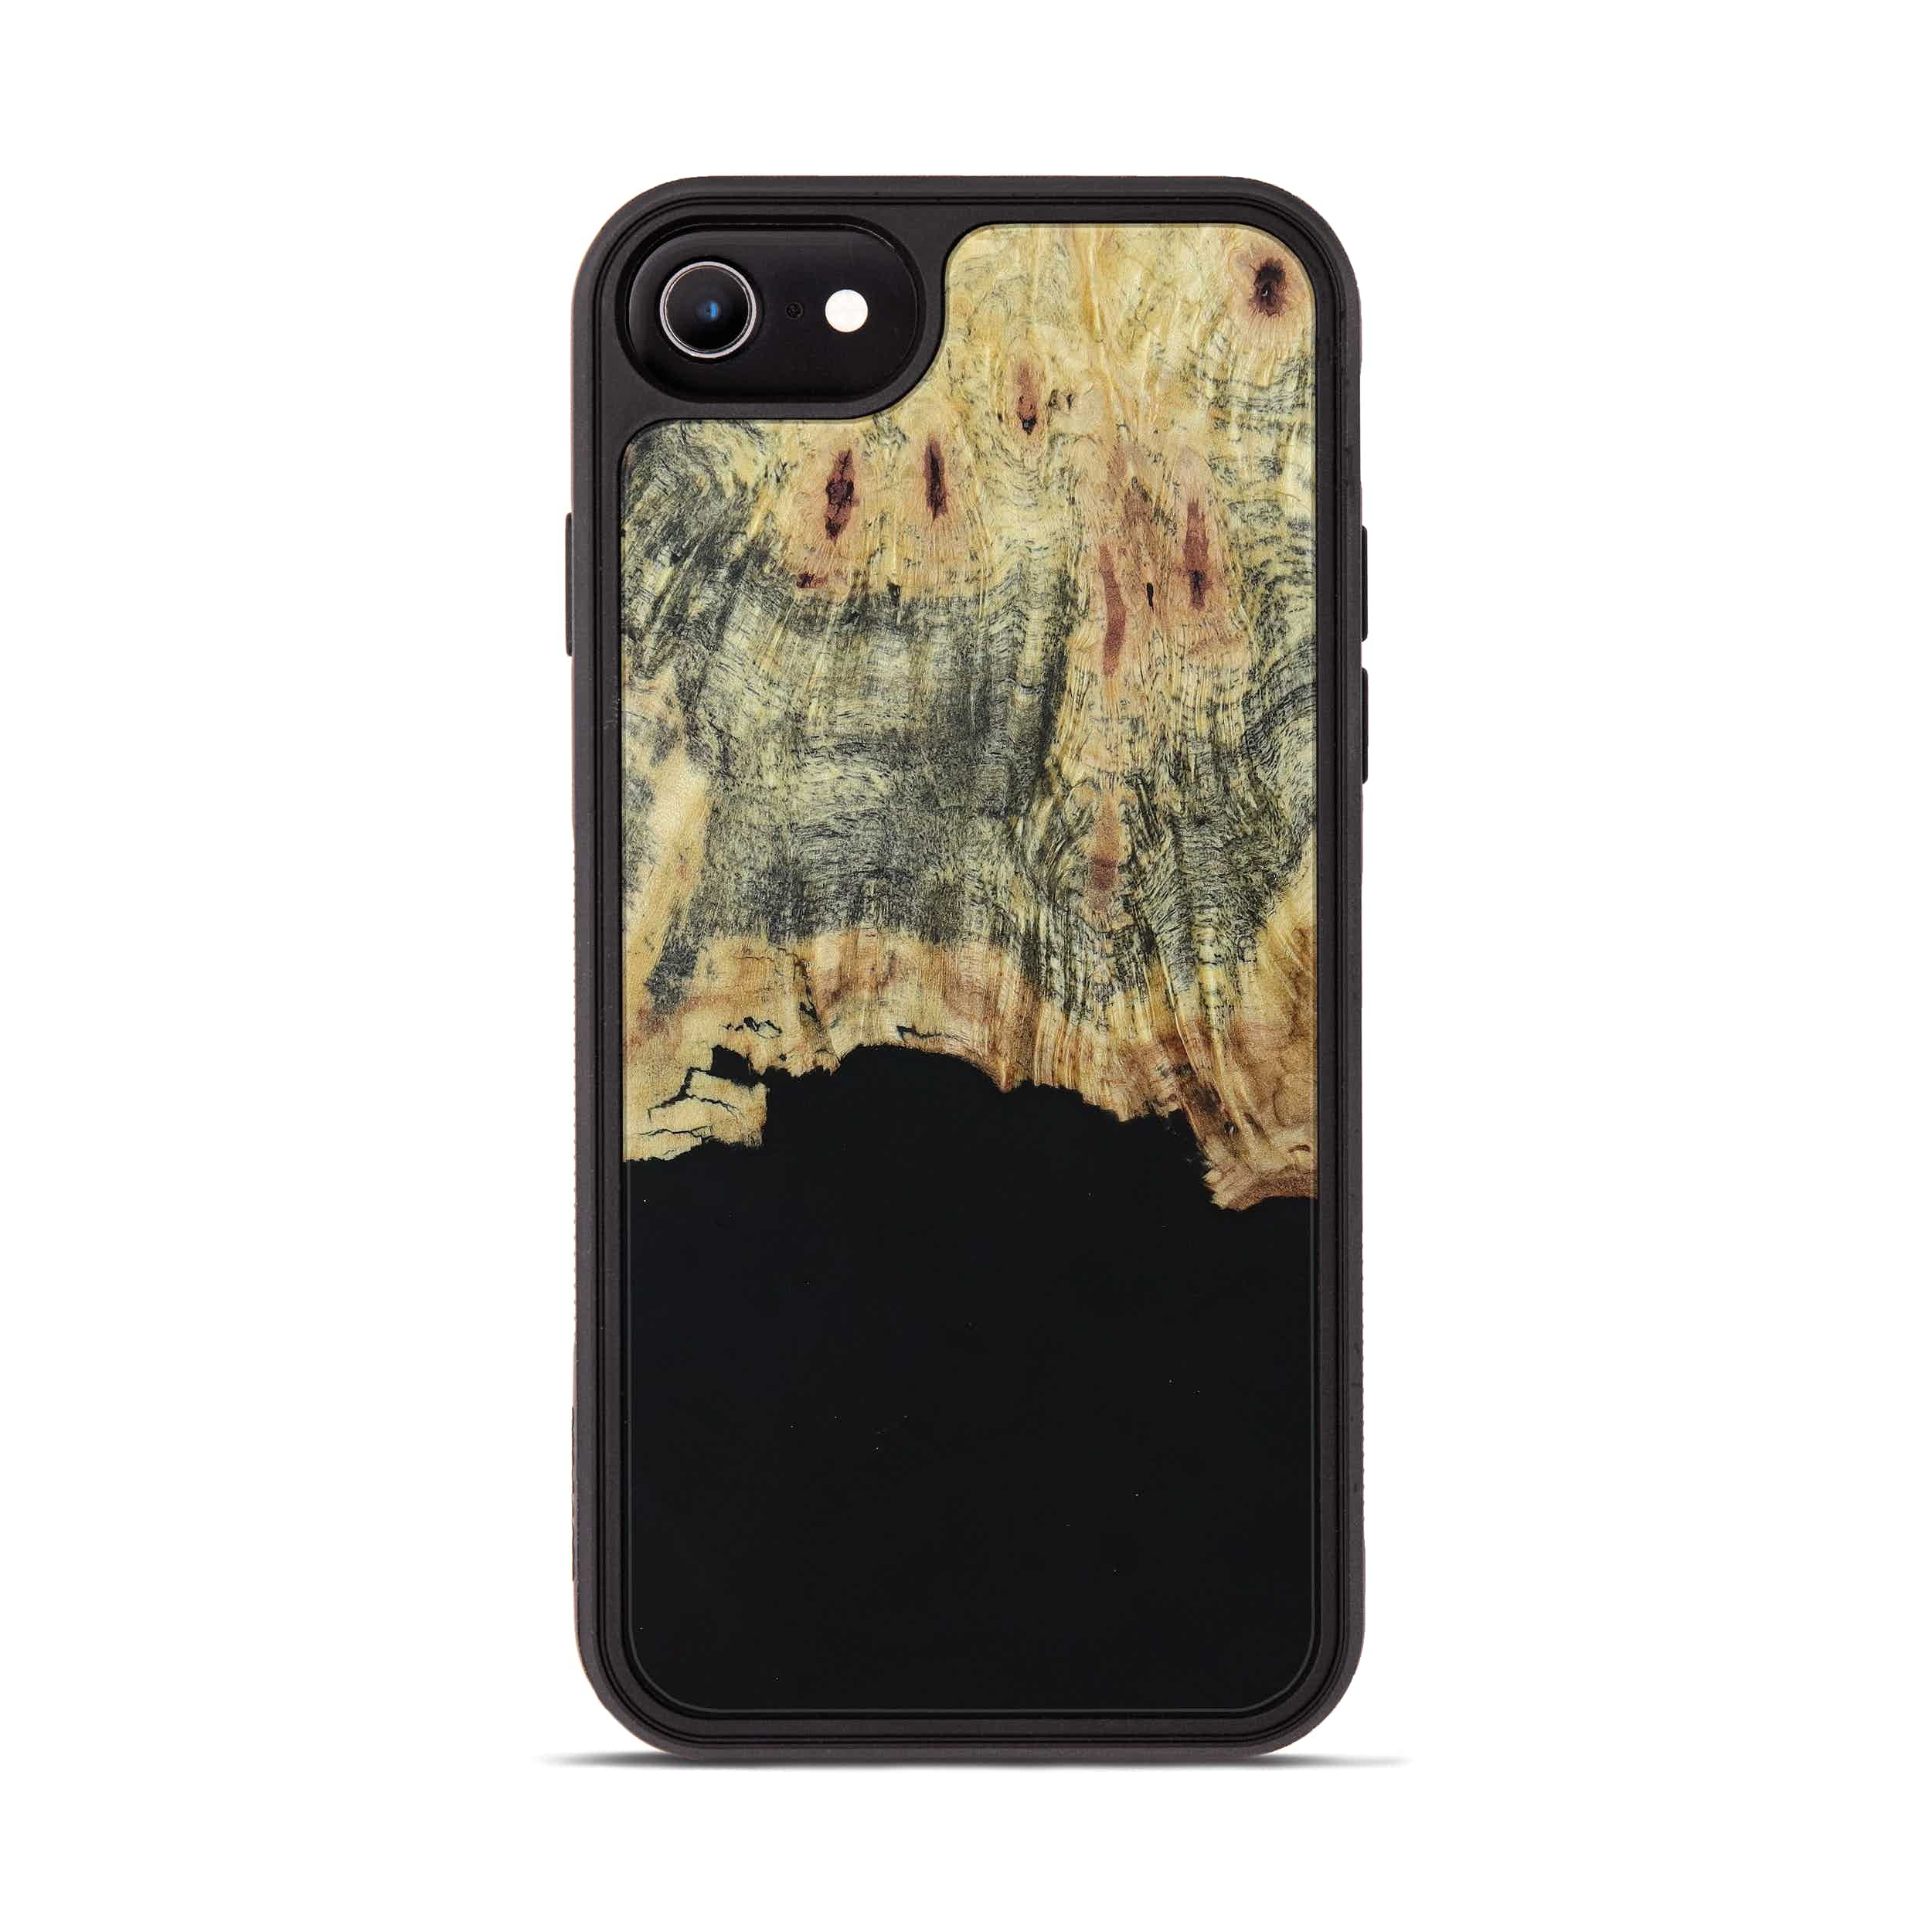 iPhone 6s Wood+Resin Phone Case - Corine (Pure Black, 395895)